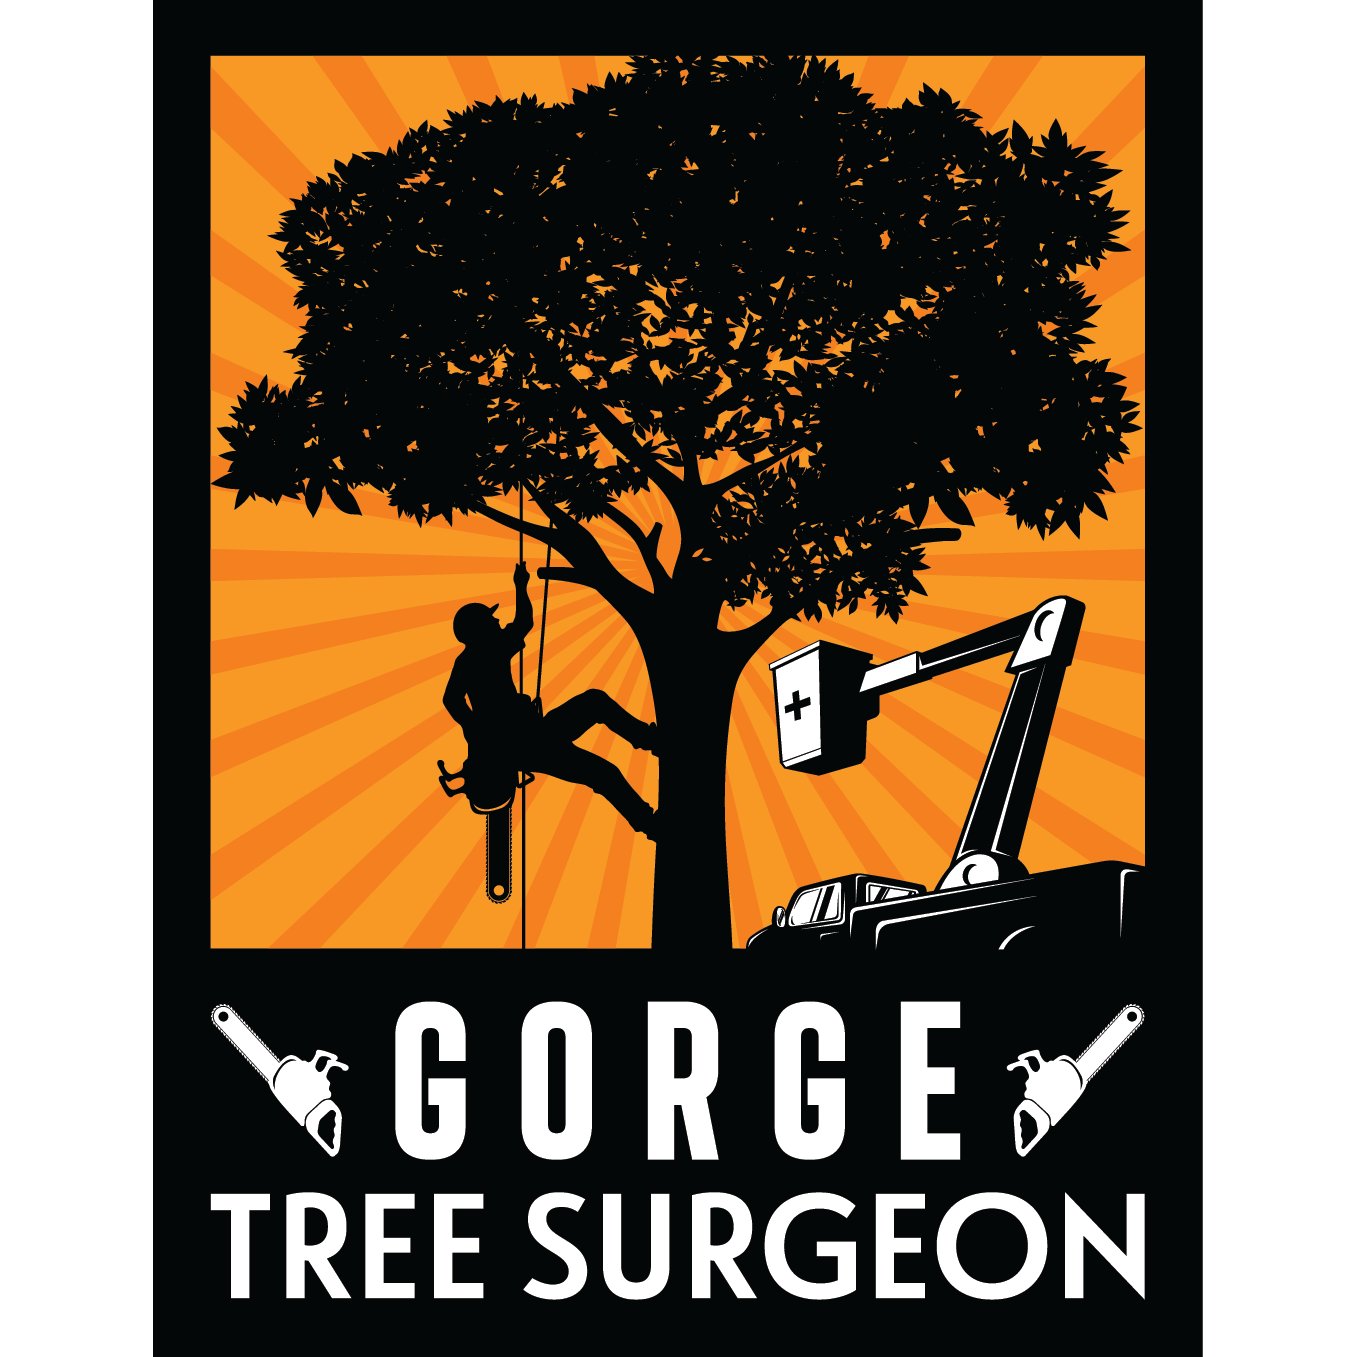 Gorge Tree Surgeon